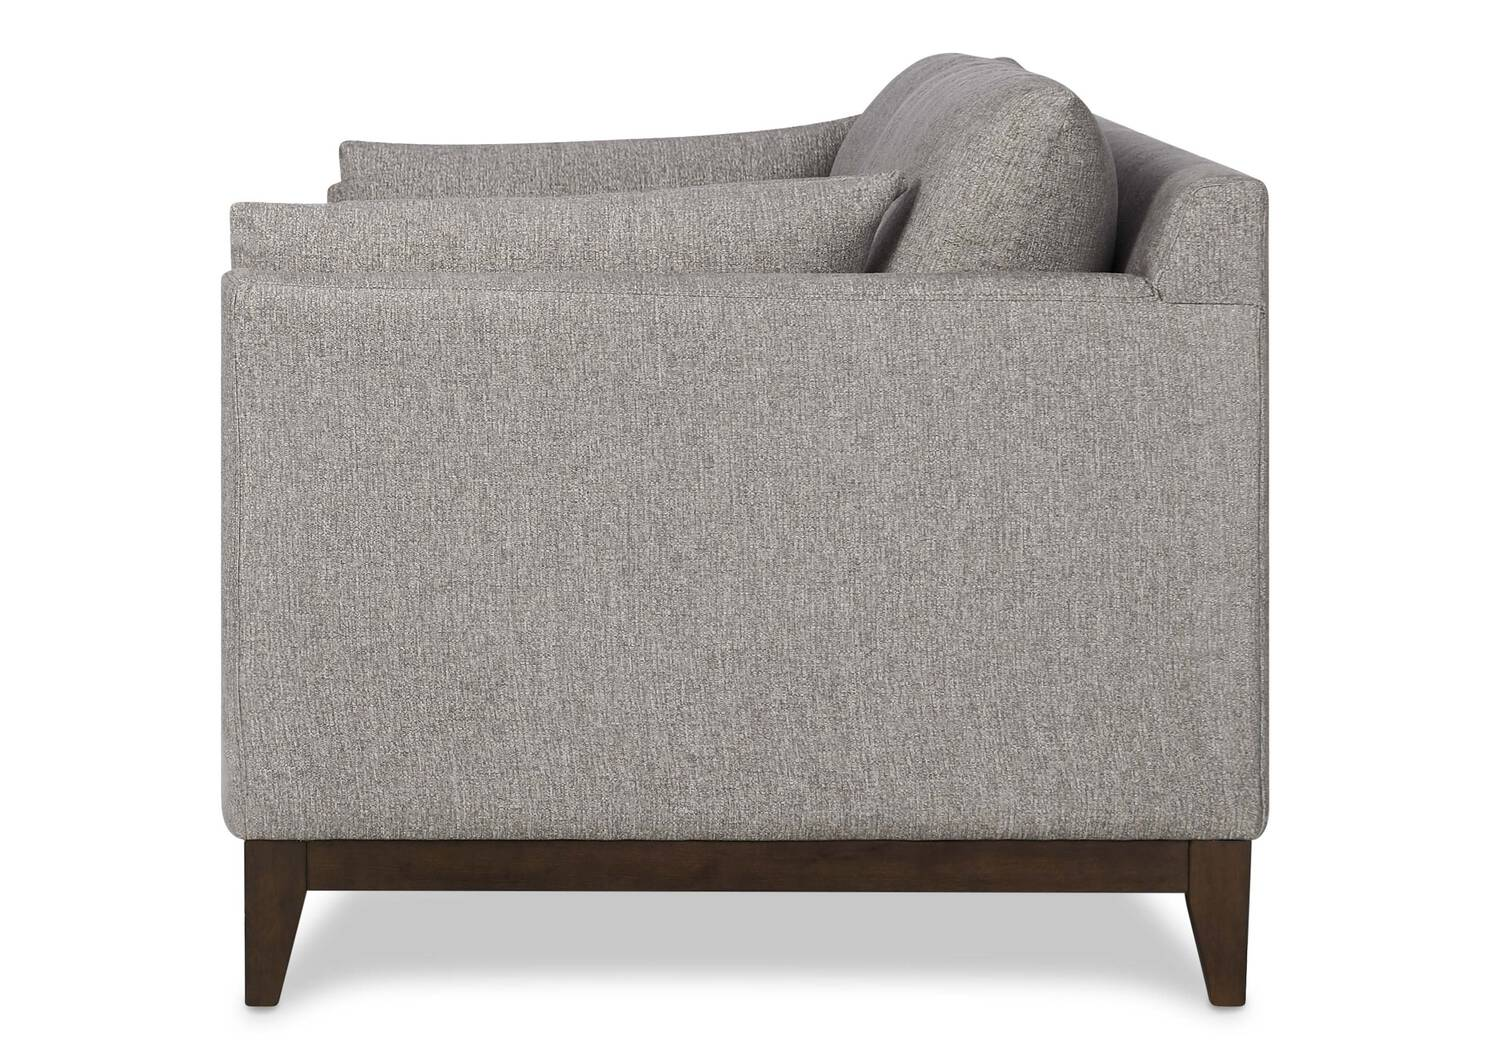 Ryerson Sofa -Rogen Fog